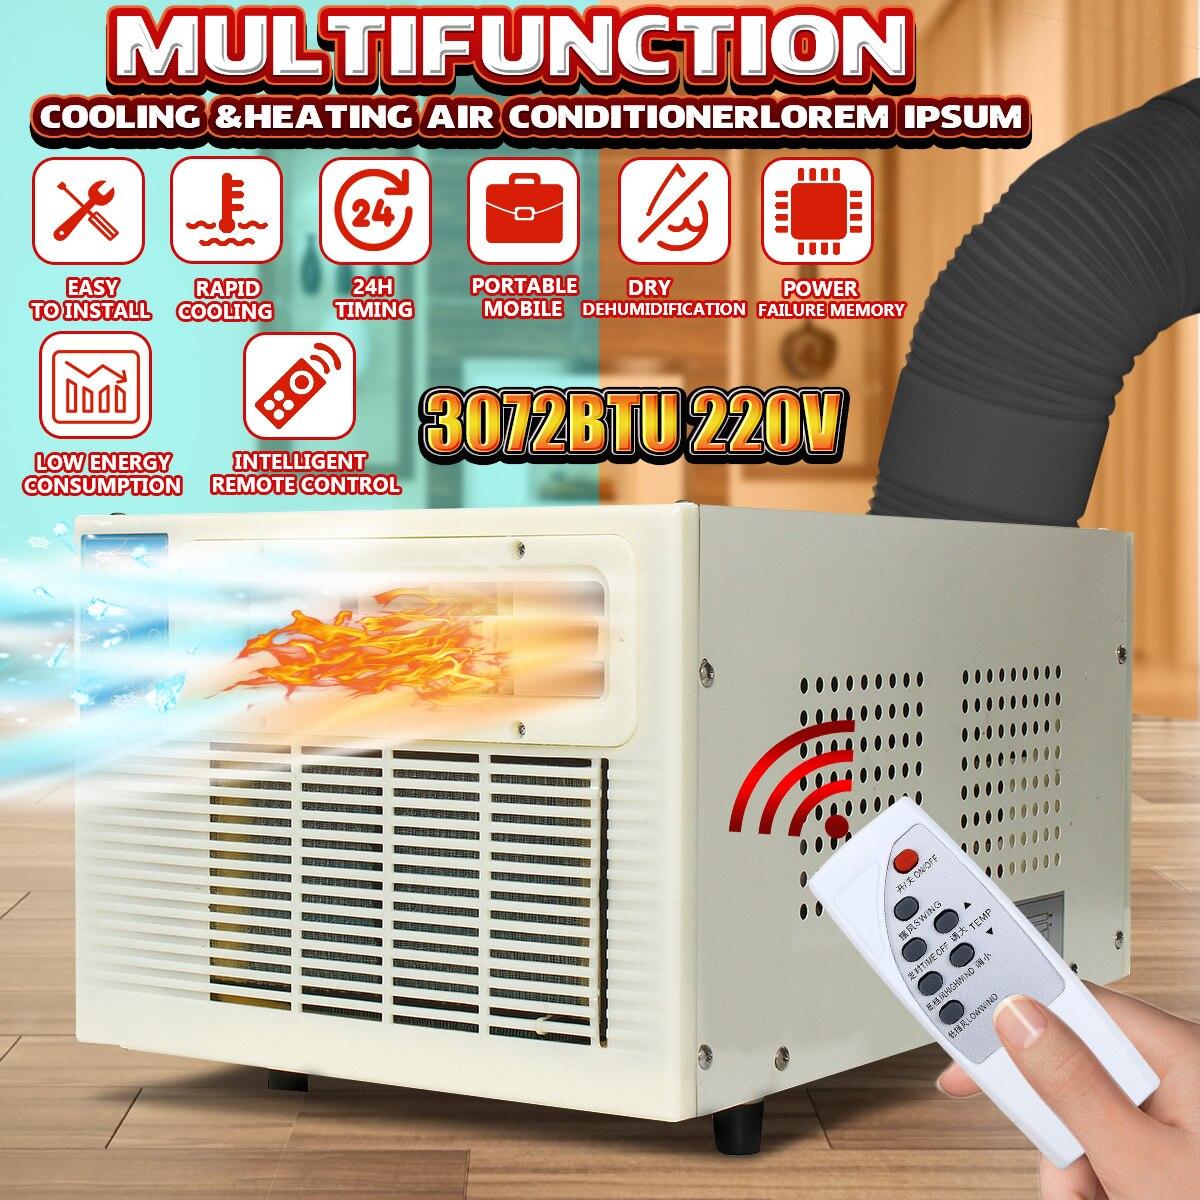 Date 900 W 3072 BTU Portable chauffage climatiseur fenêtre climatiseur refroidissement chauffage froid/chaleur déshumidification 220 V